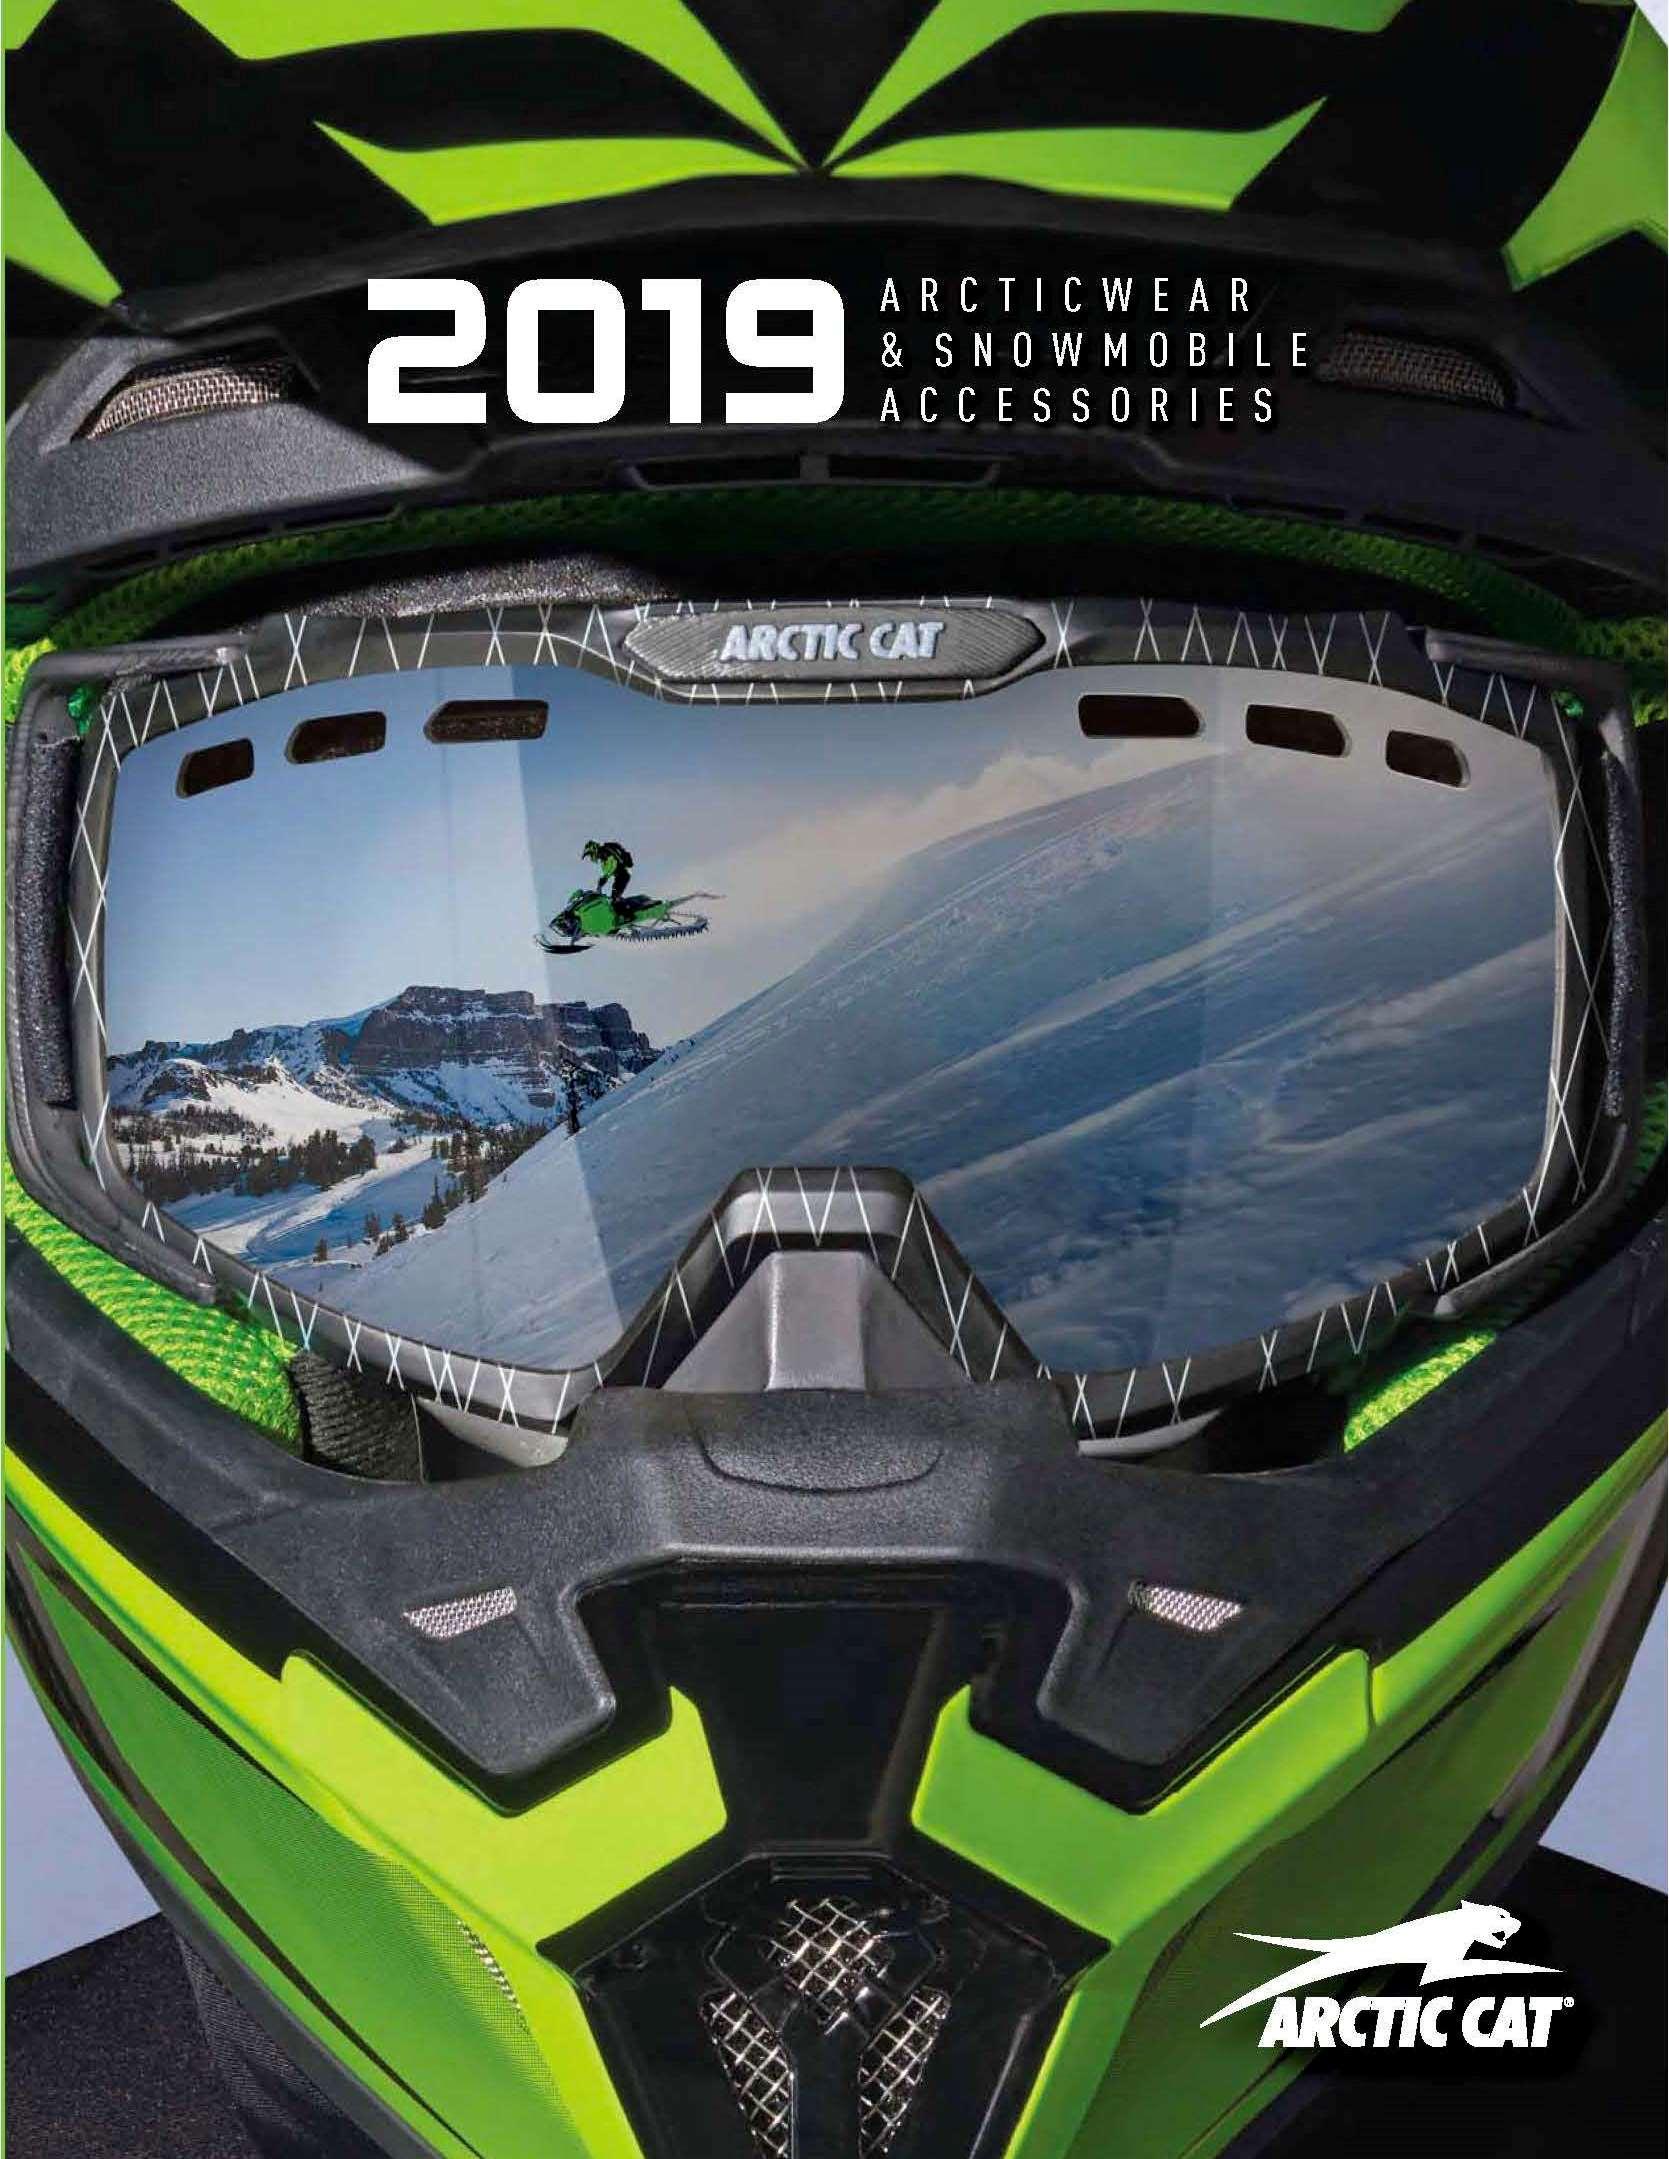 2019 Snow Catalog